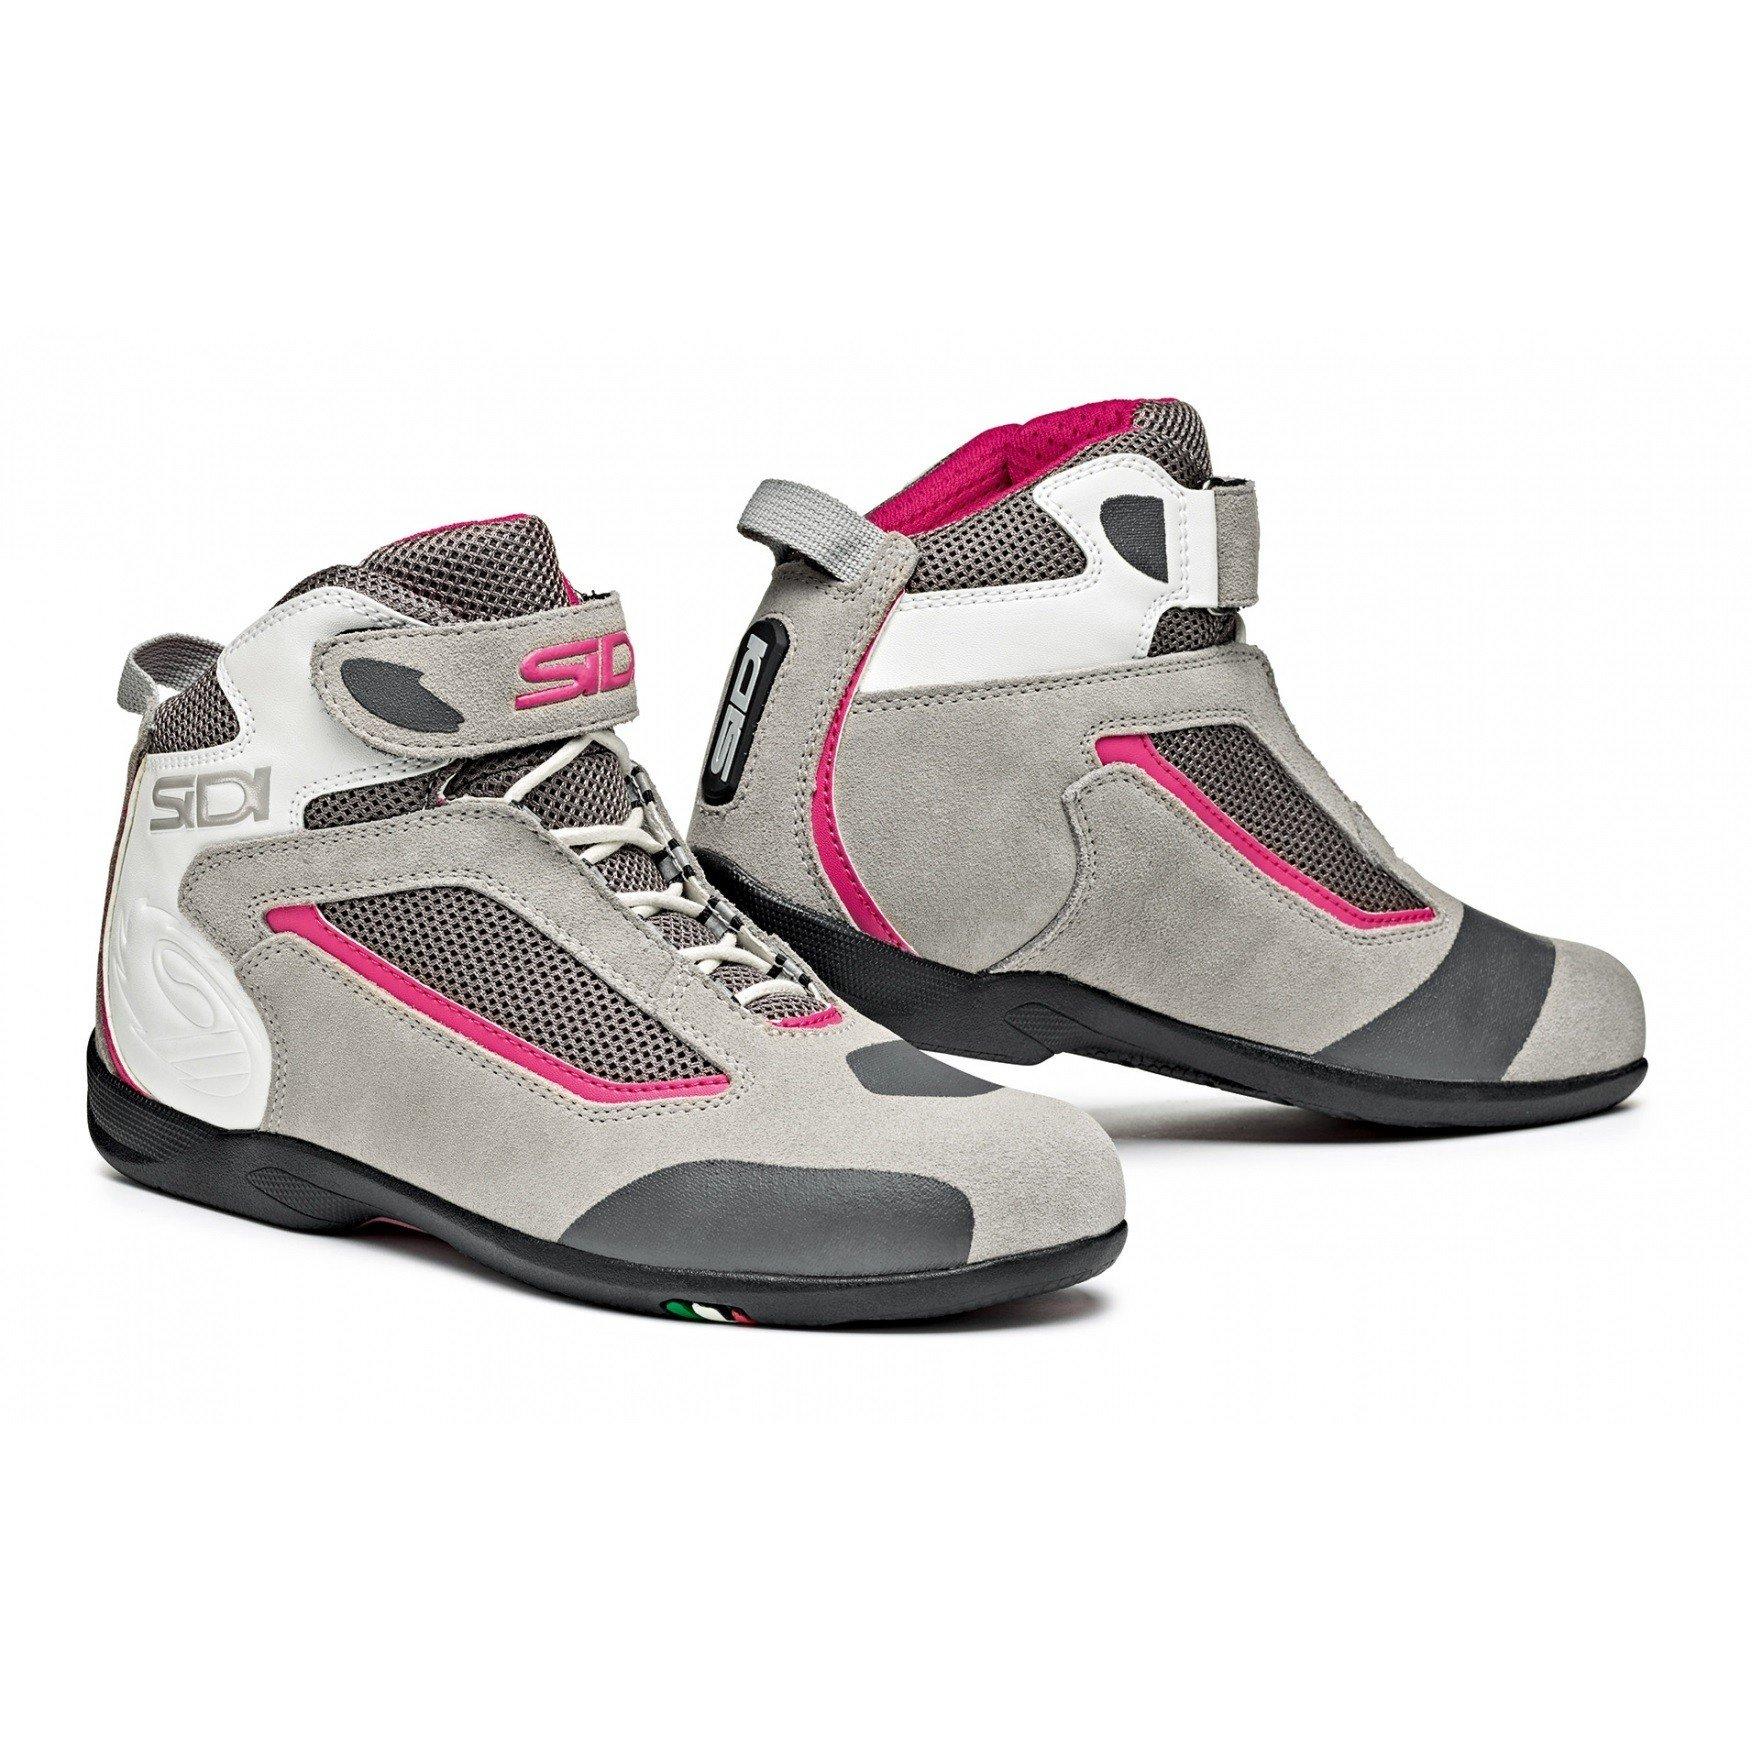 SIDI GAS Grey/Pink 37